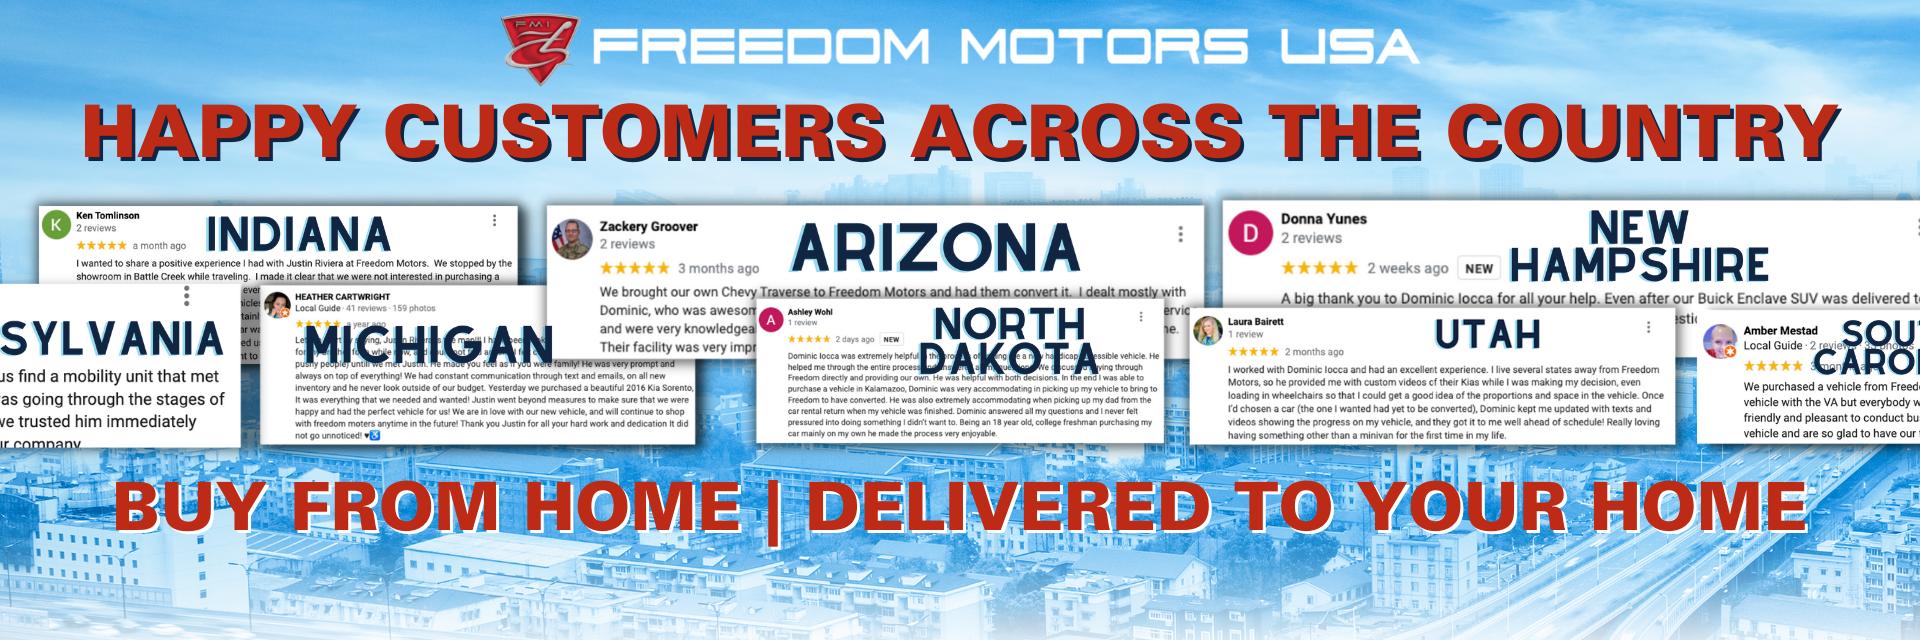 https://www.freedommotors.com/about-us/customer-testimonials/